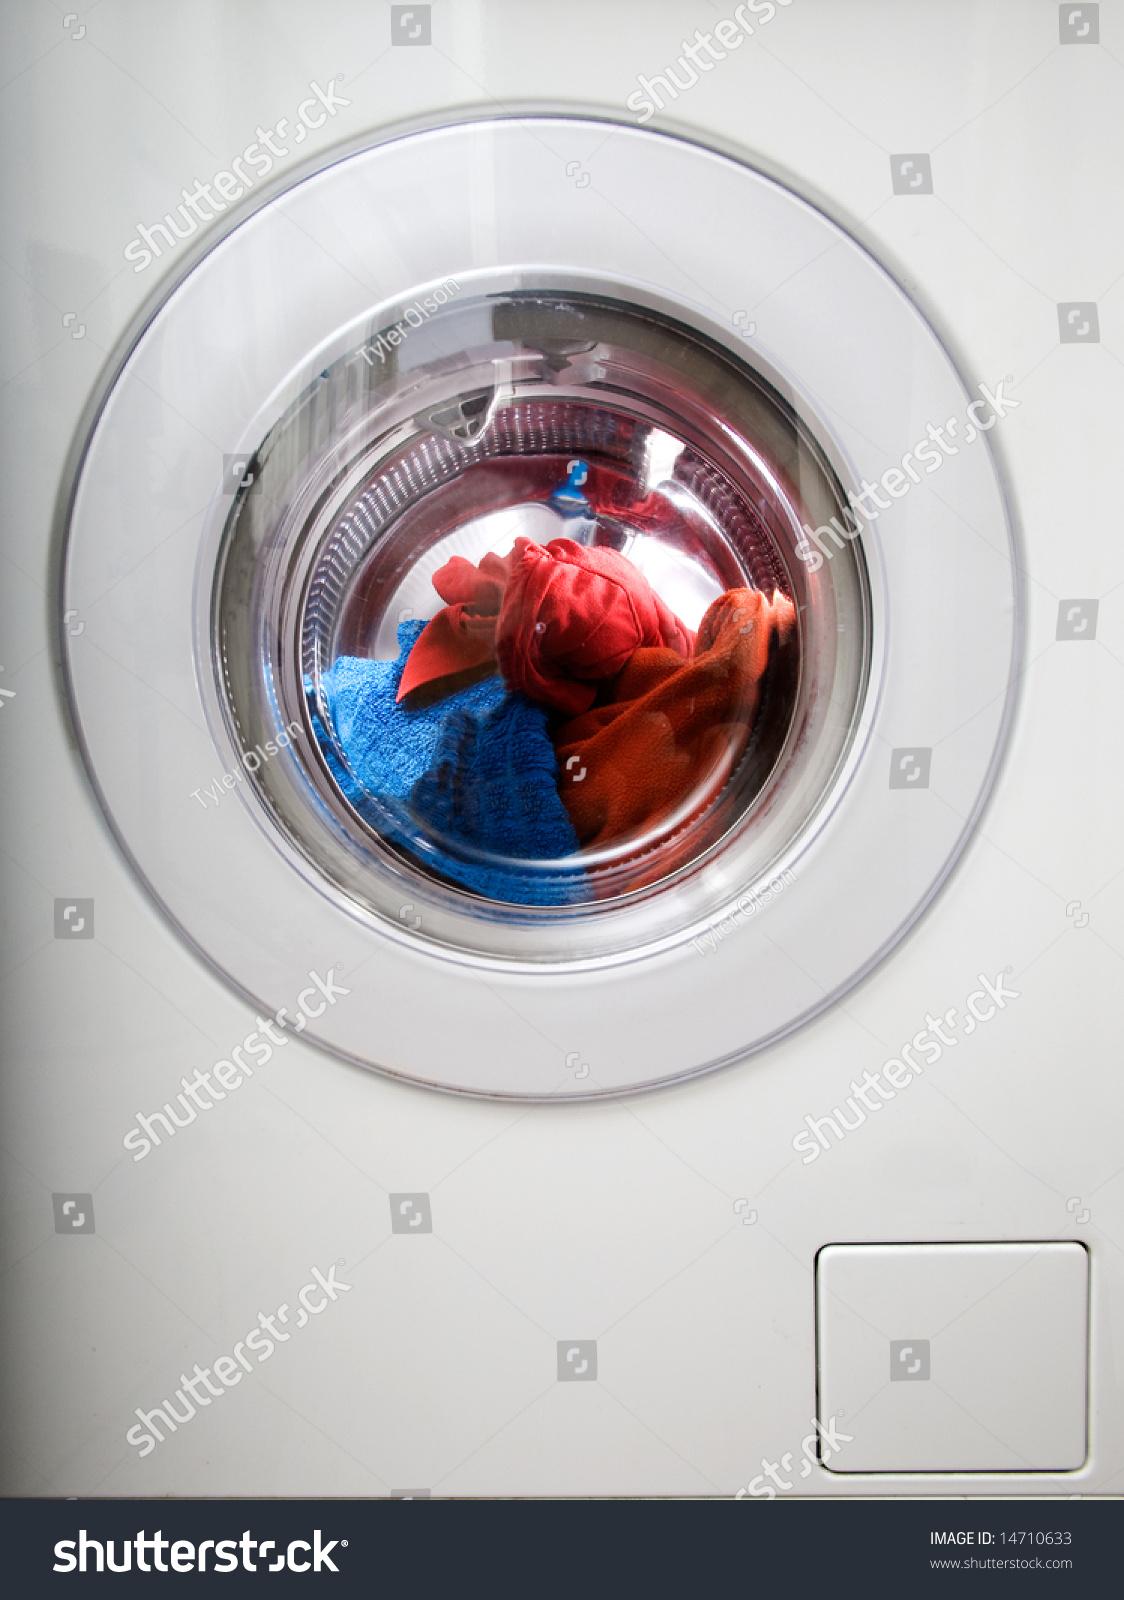 washing machine instructions on clothes